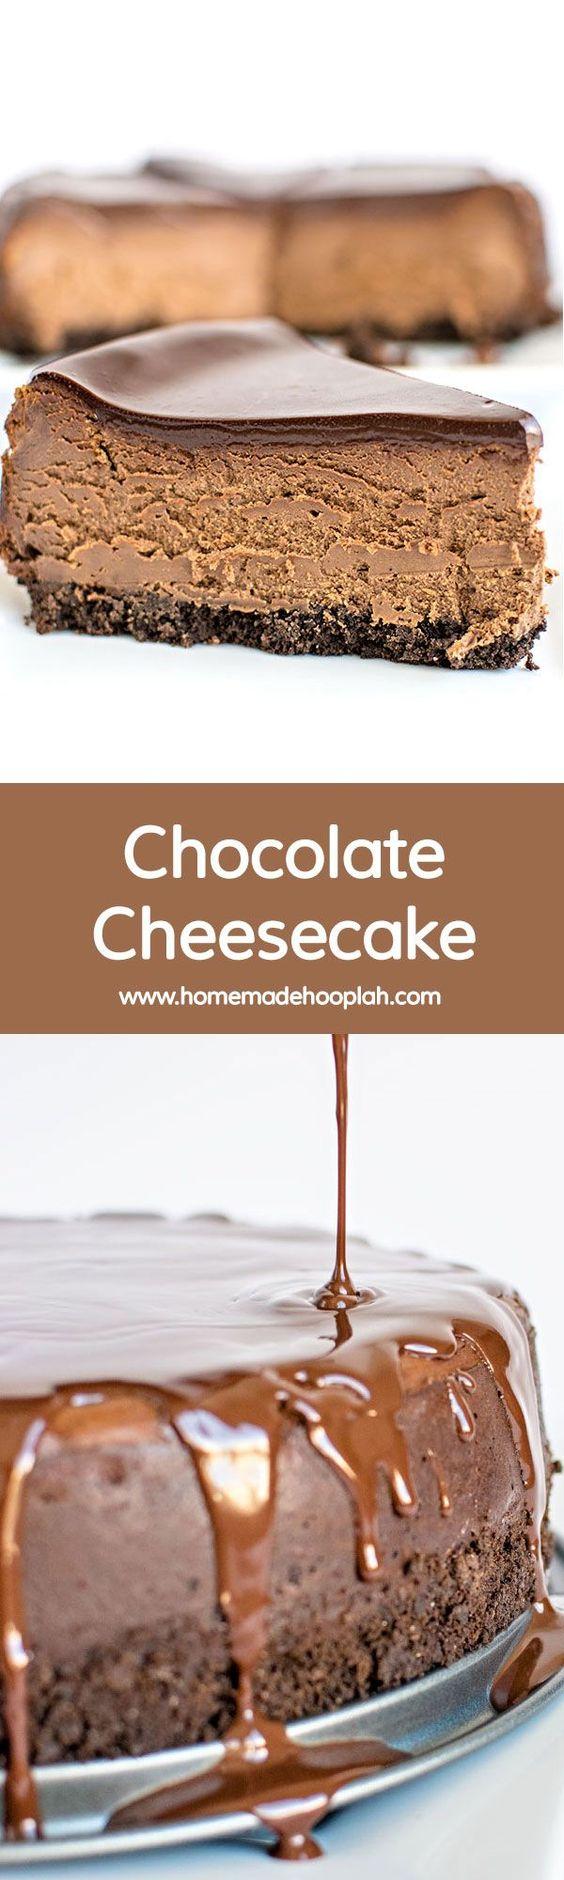 Chocolate Cheesecake! The traditional chocolate cheesecake, complete with chocolate ganache topping. | HomemadeHooplah.com